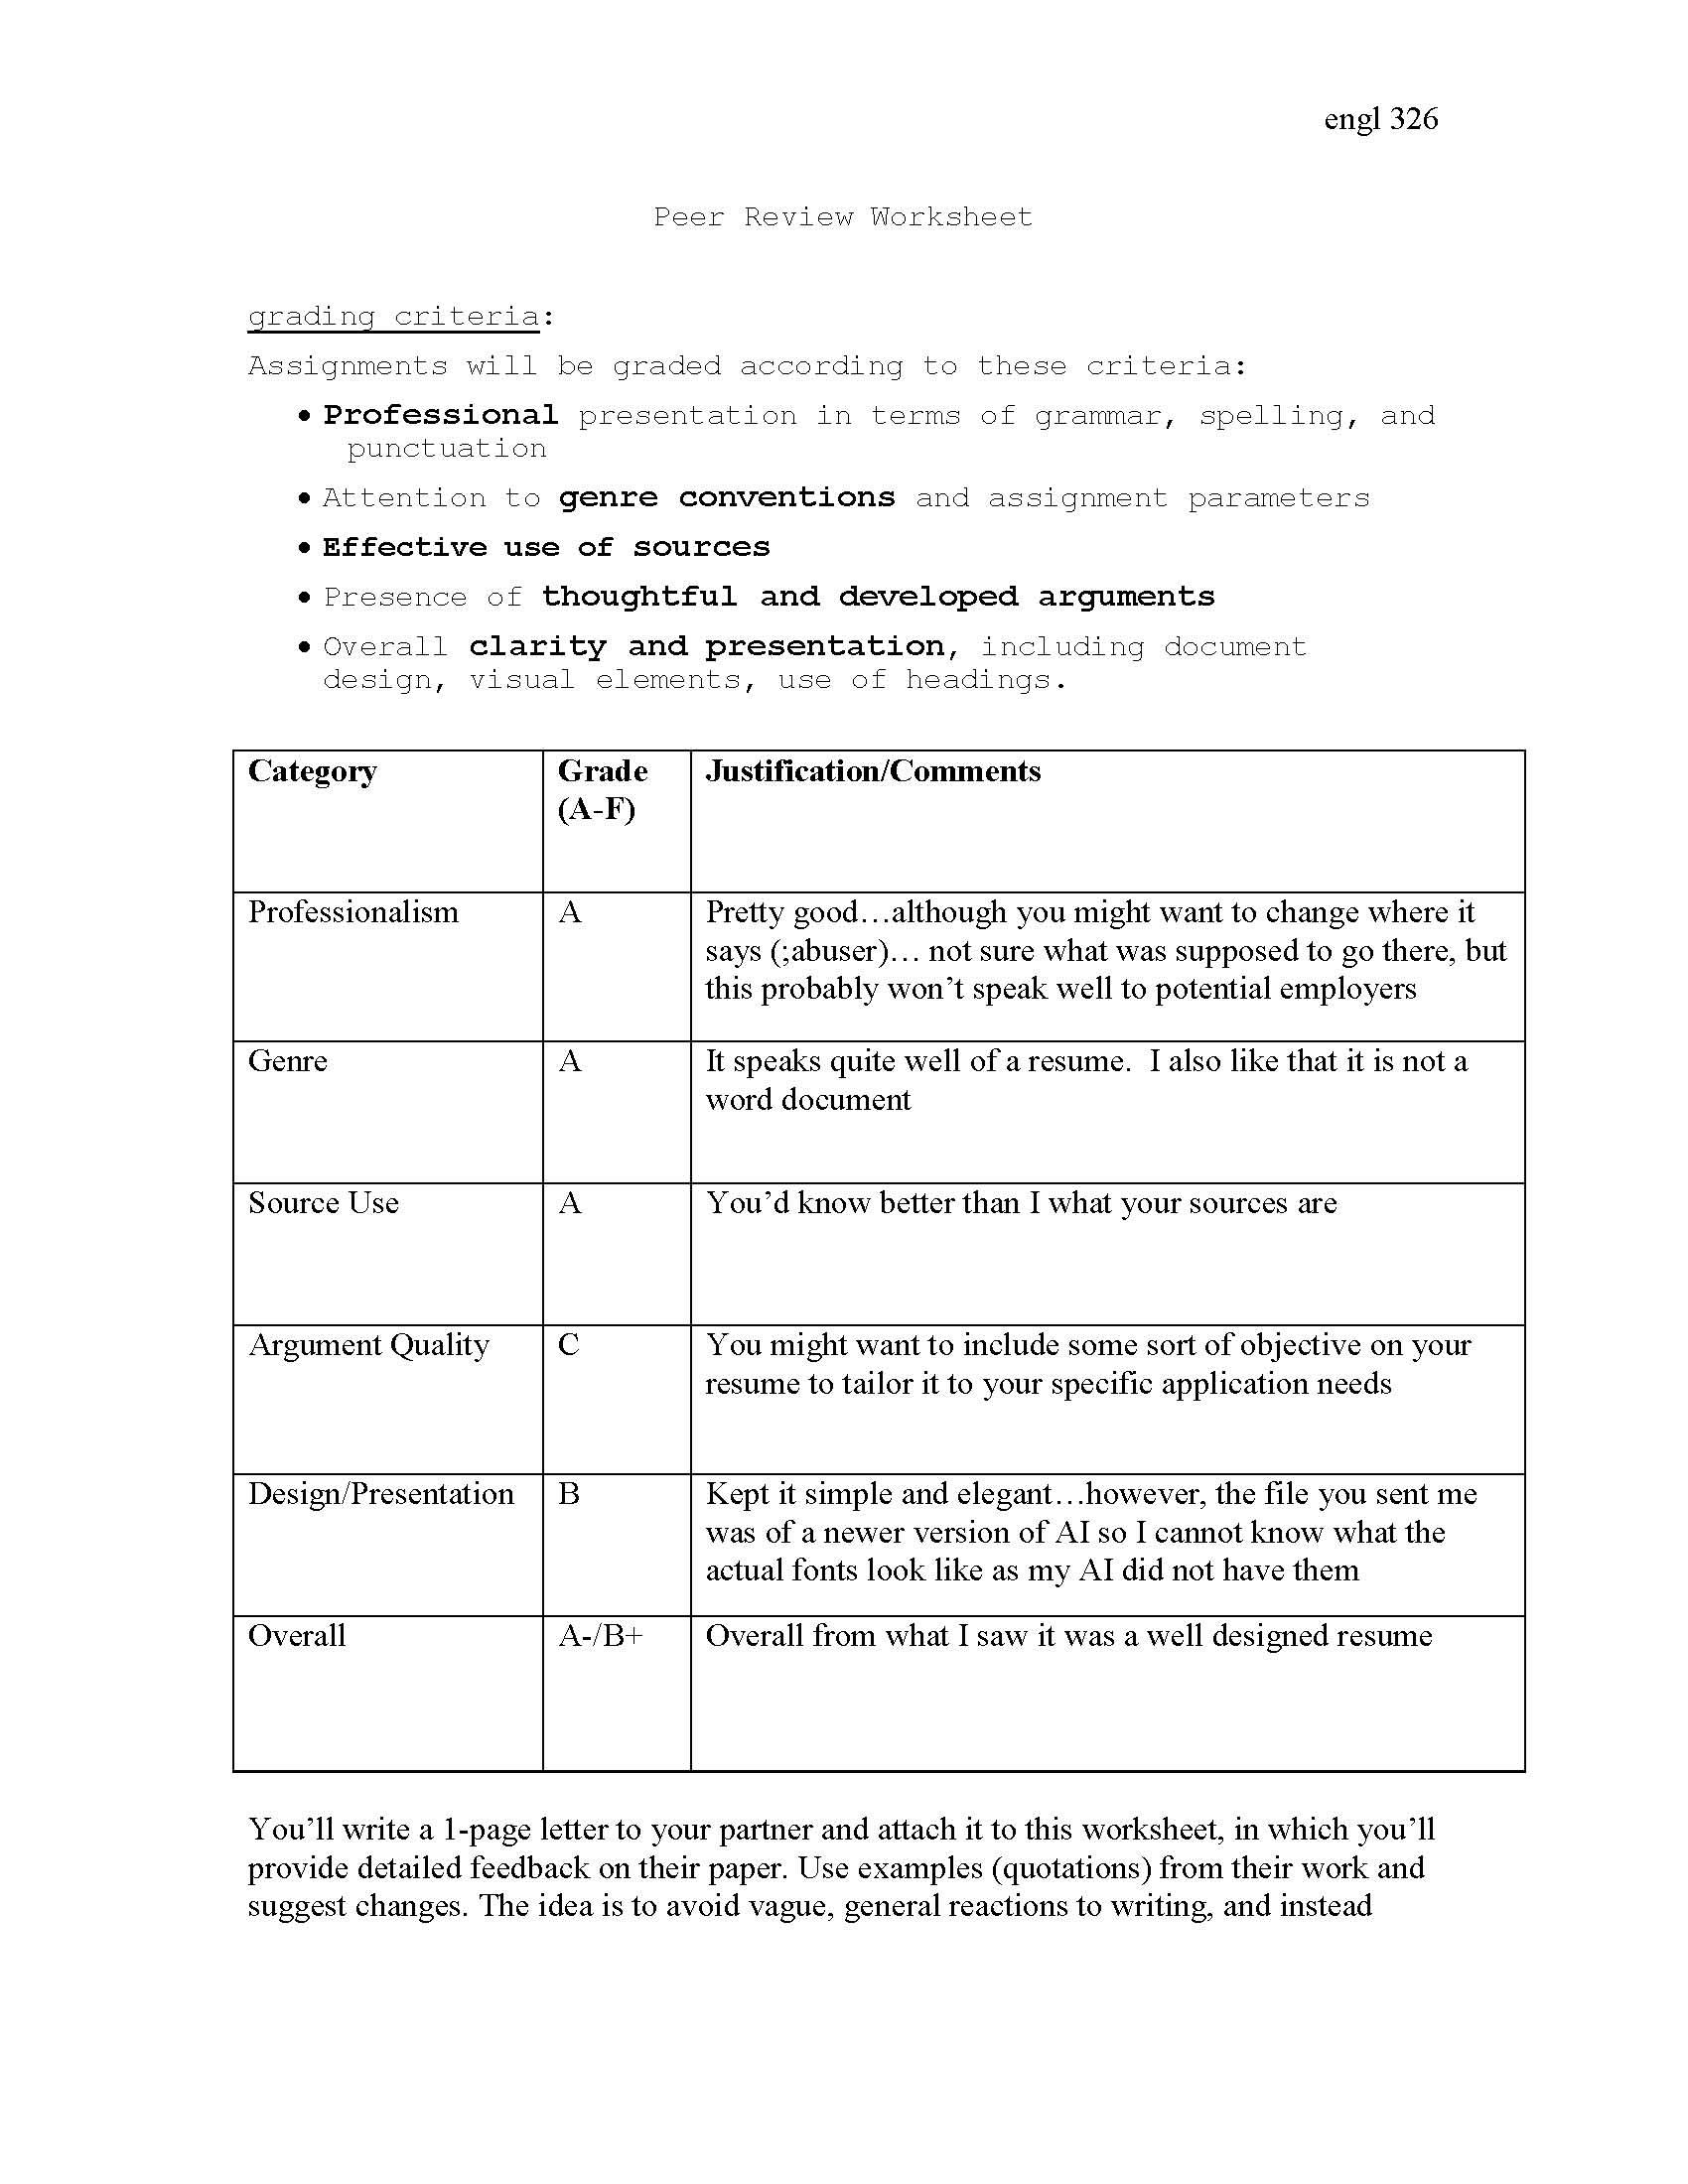 resume review worksheet